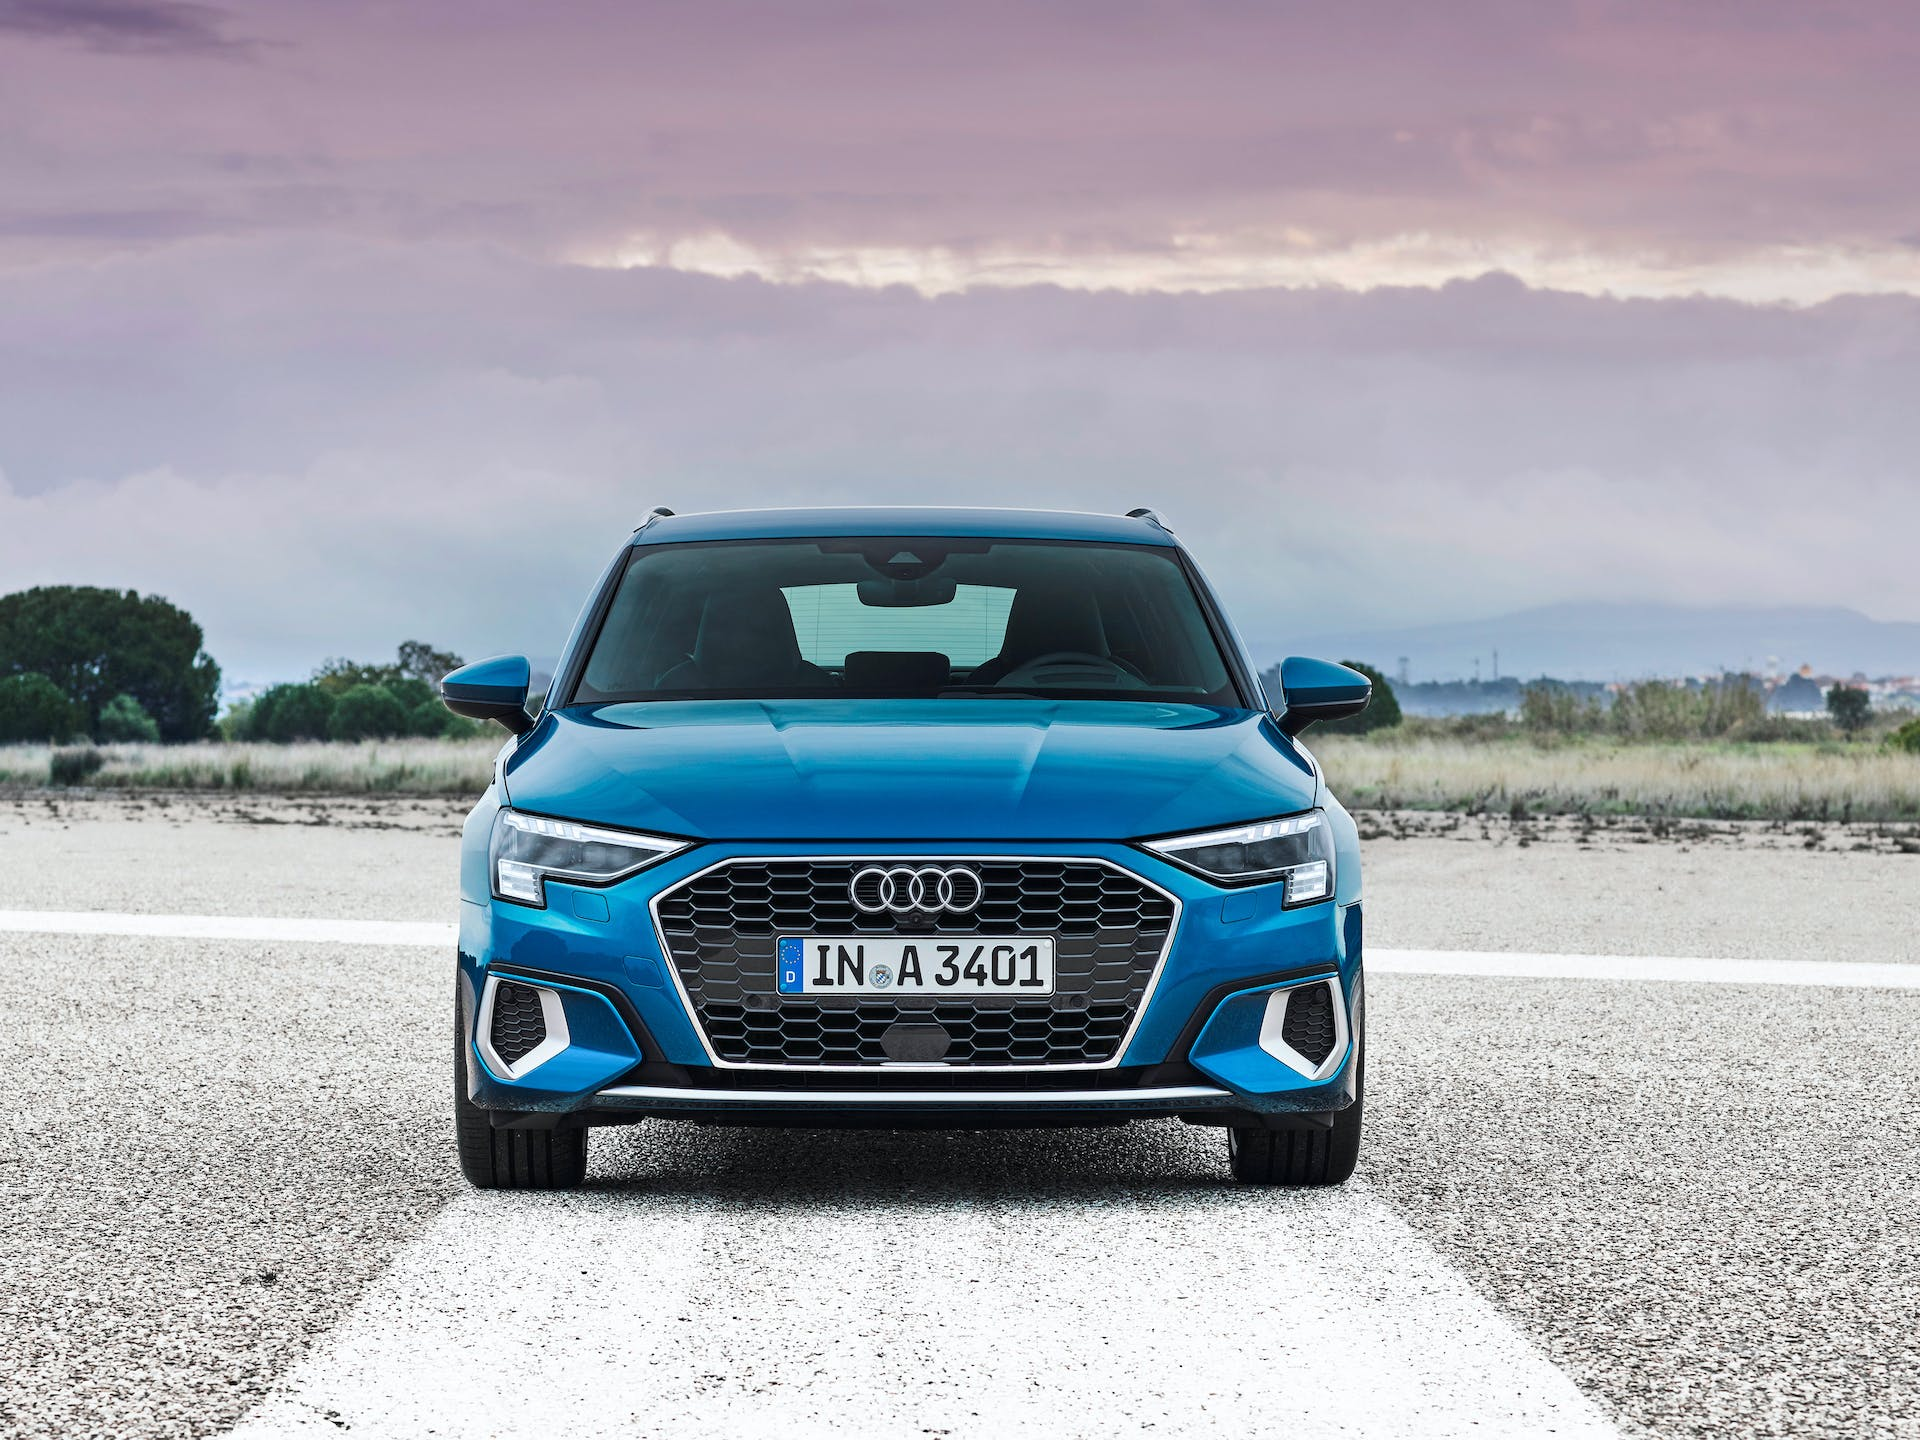 Nuova Audi A3 Sportback frontale pieno